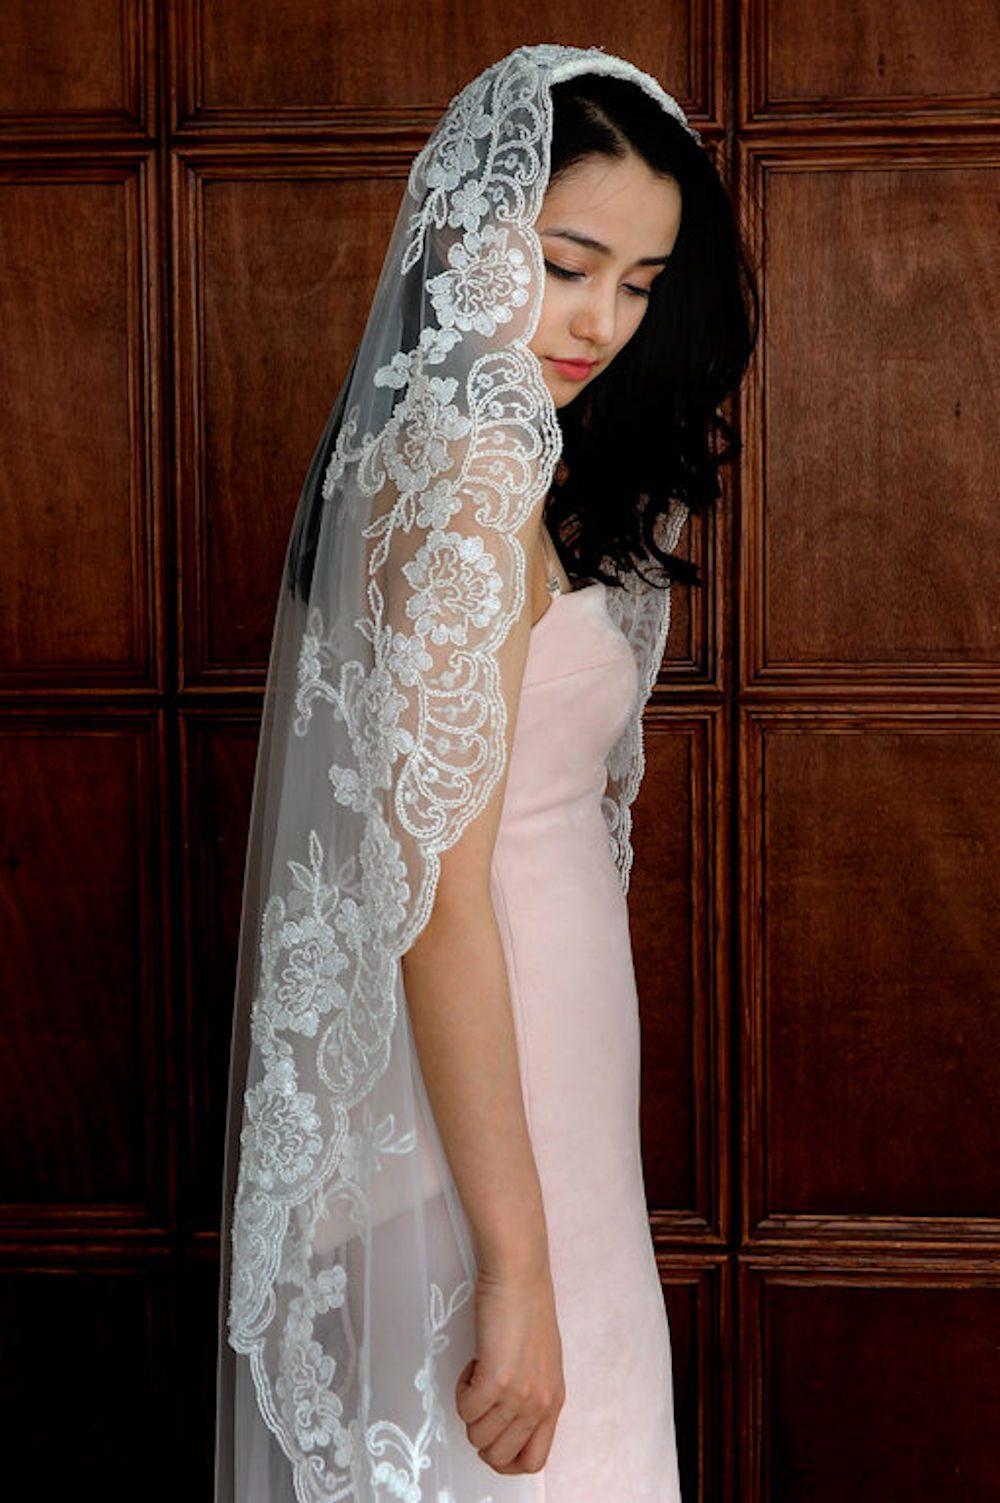 Kiu - Bridal Veils Melbourne